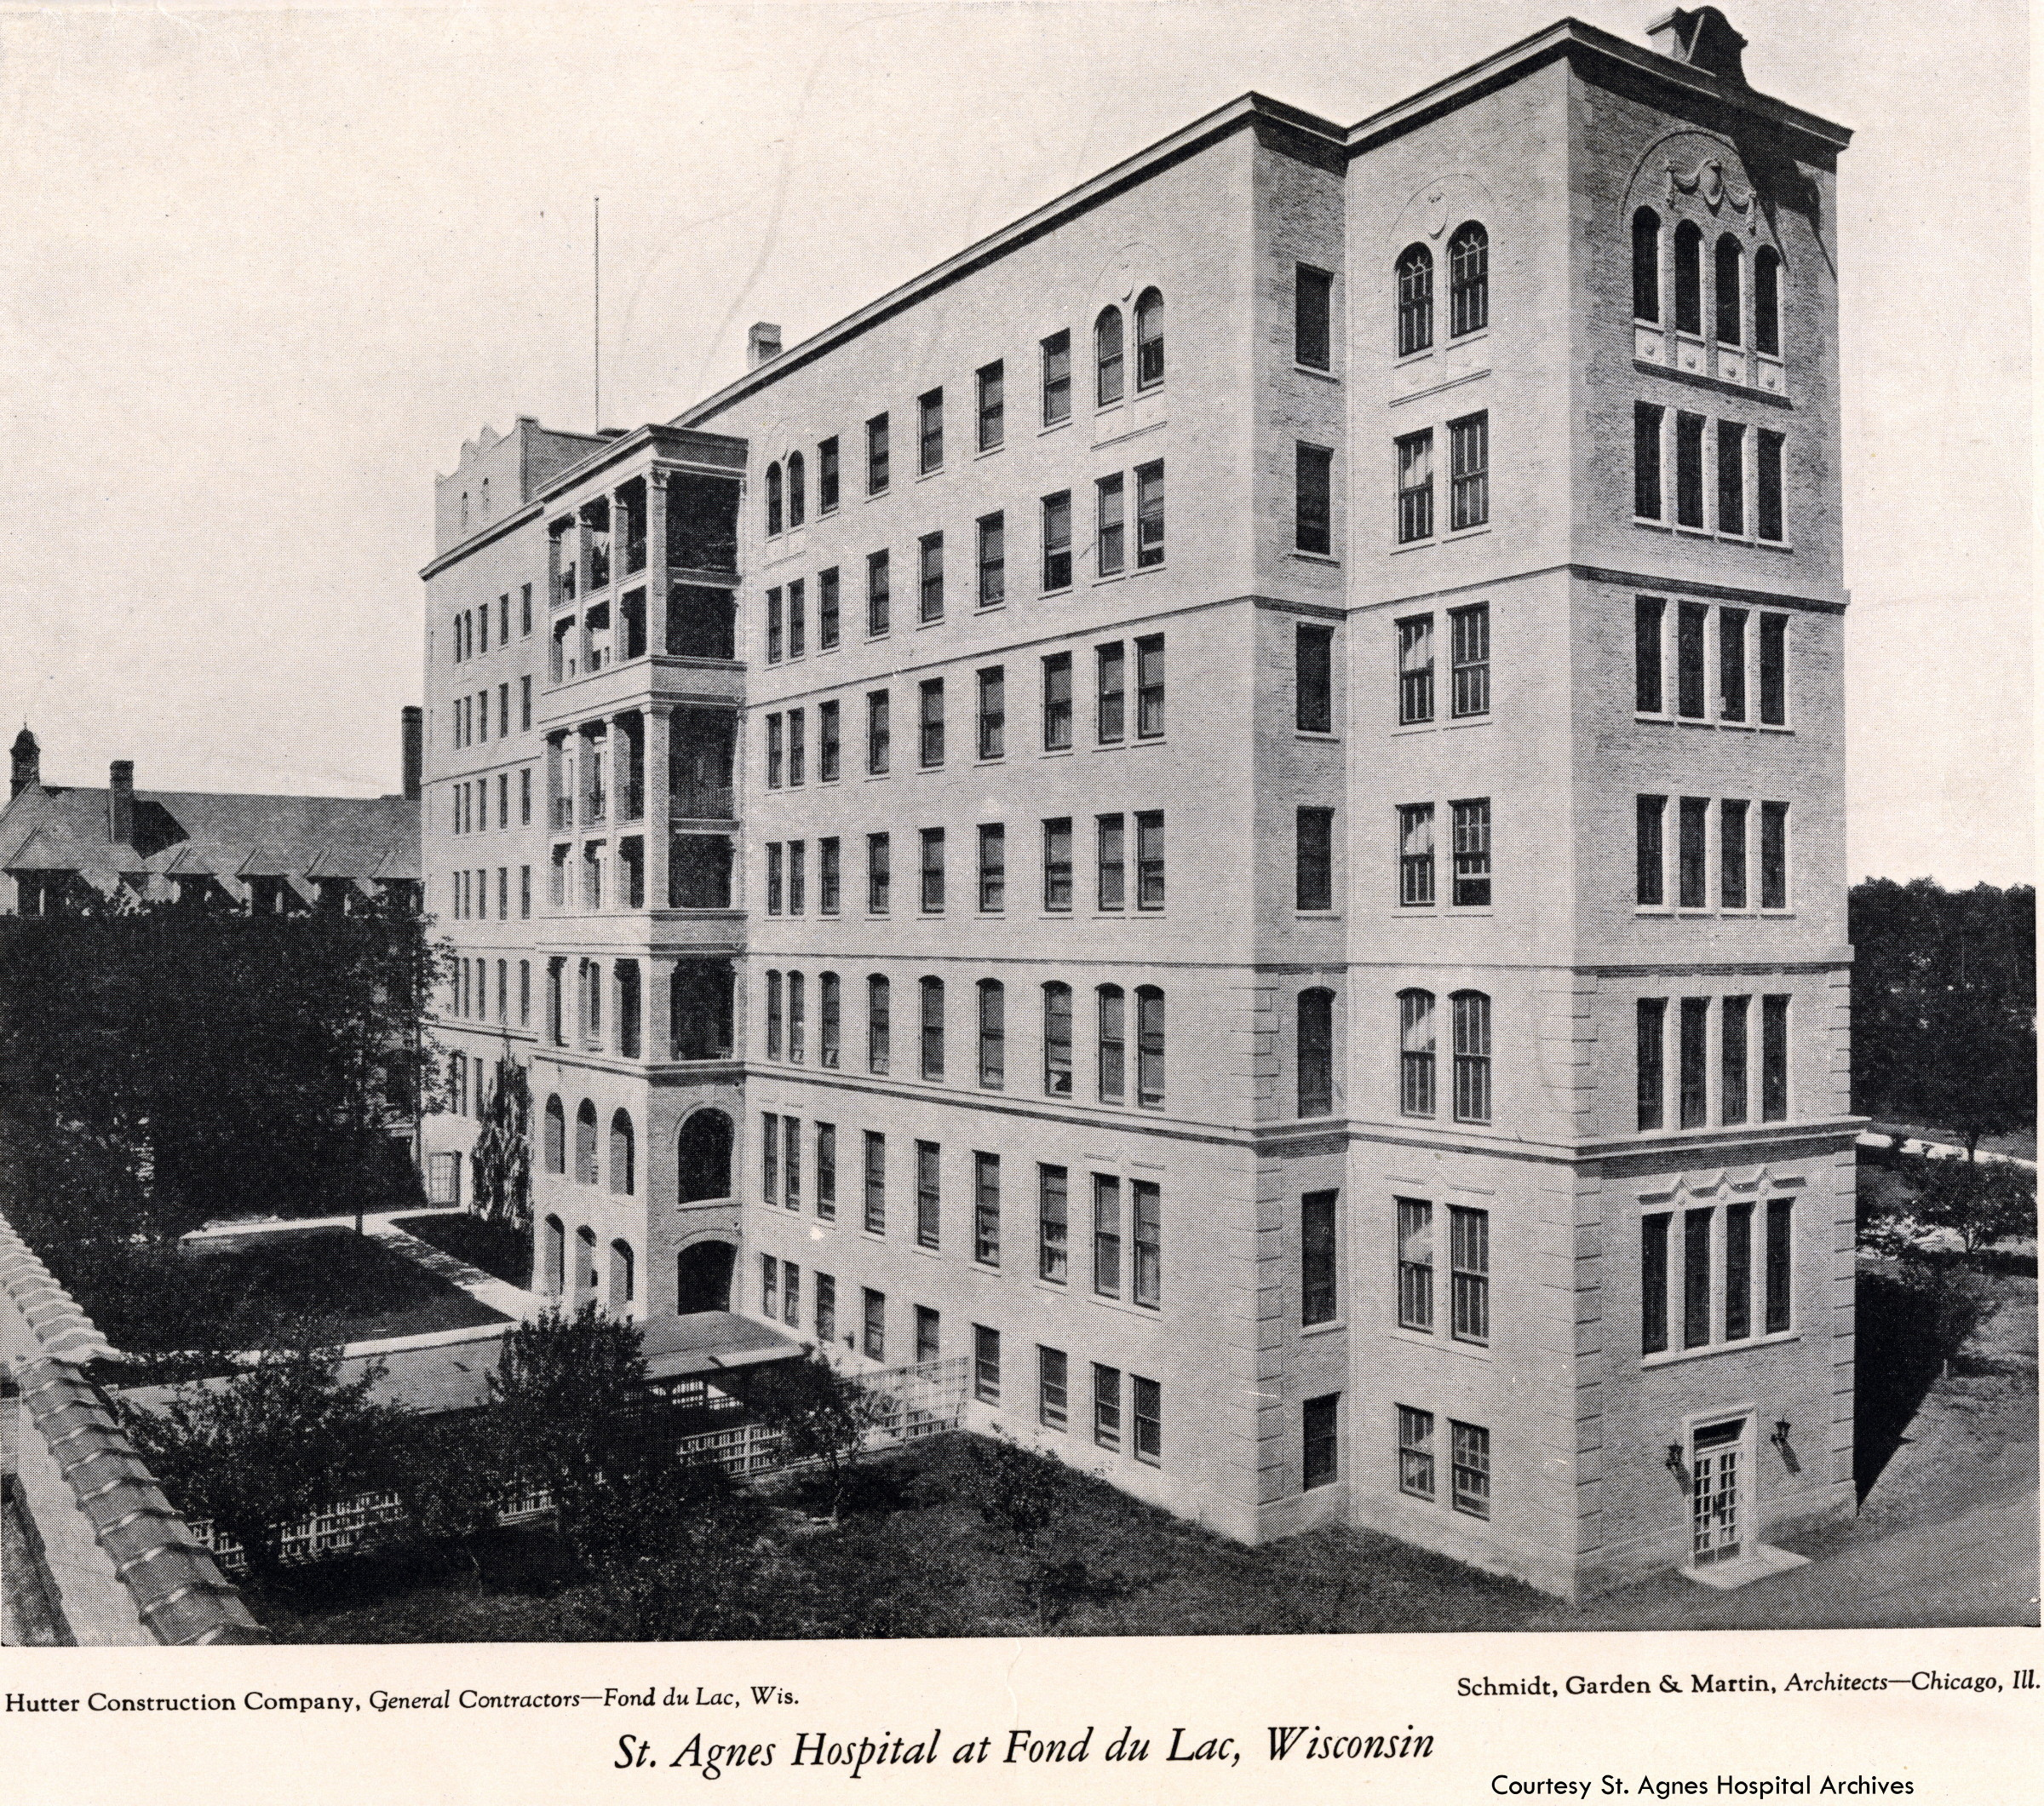 New St. Agnes Hospital building, c. 1925.